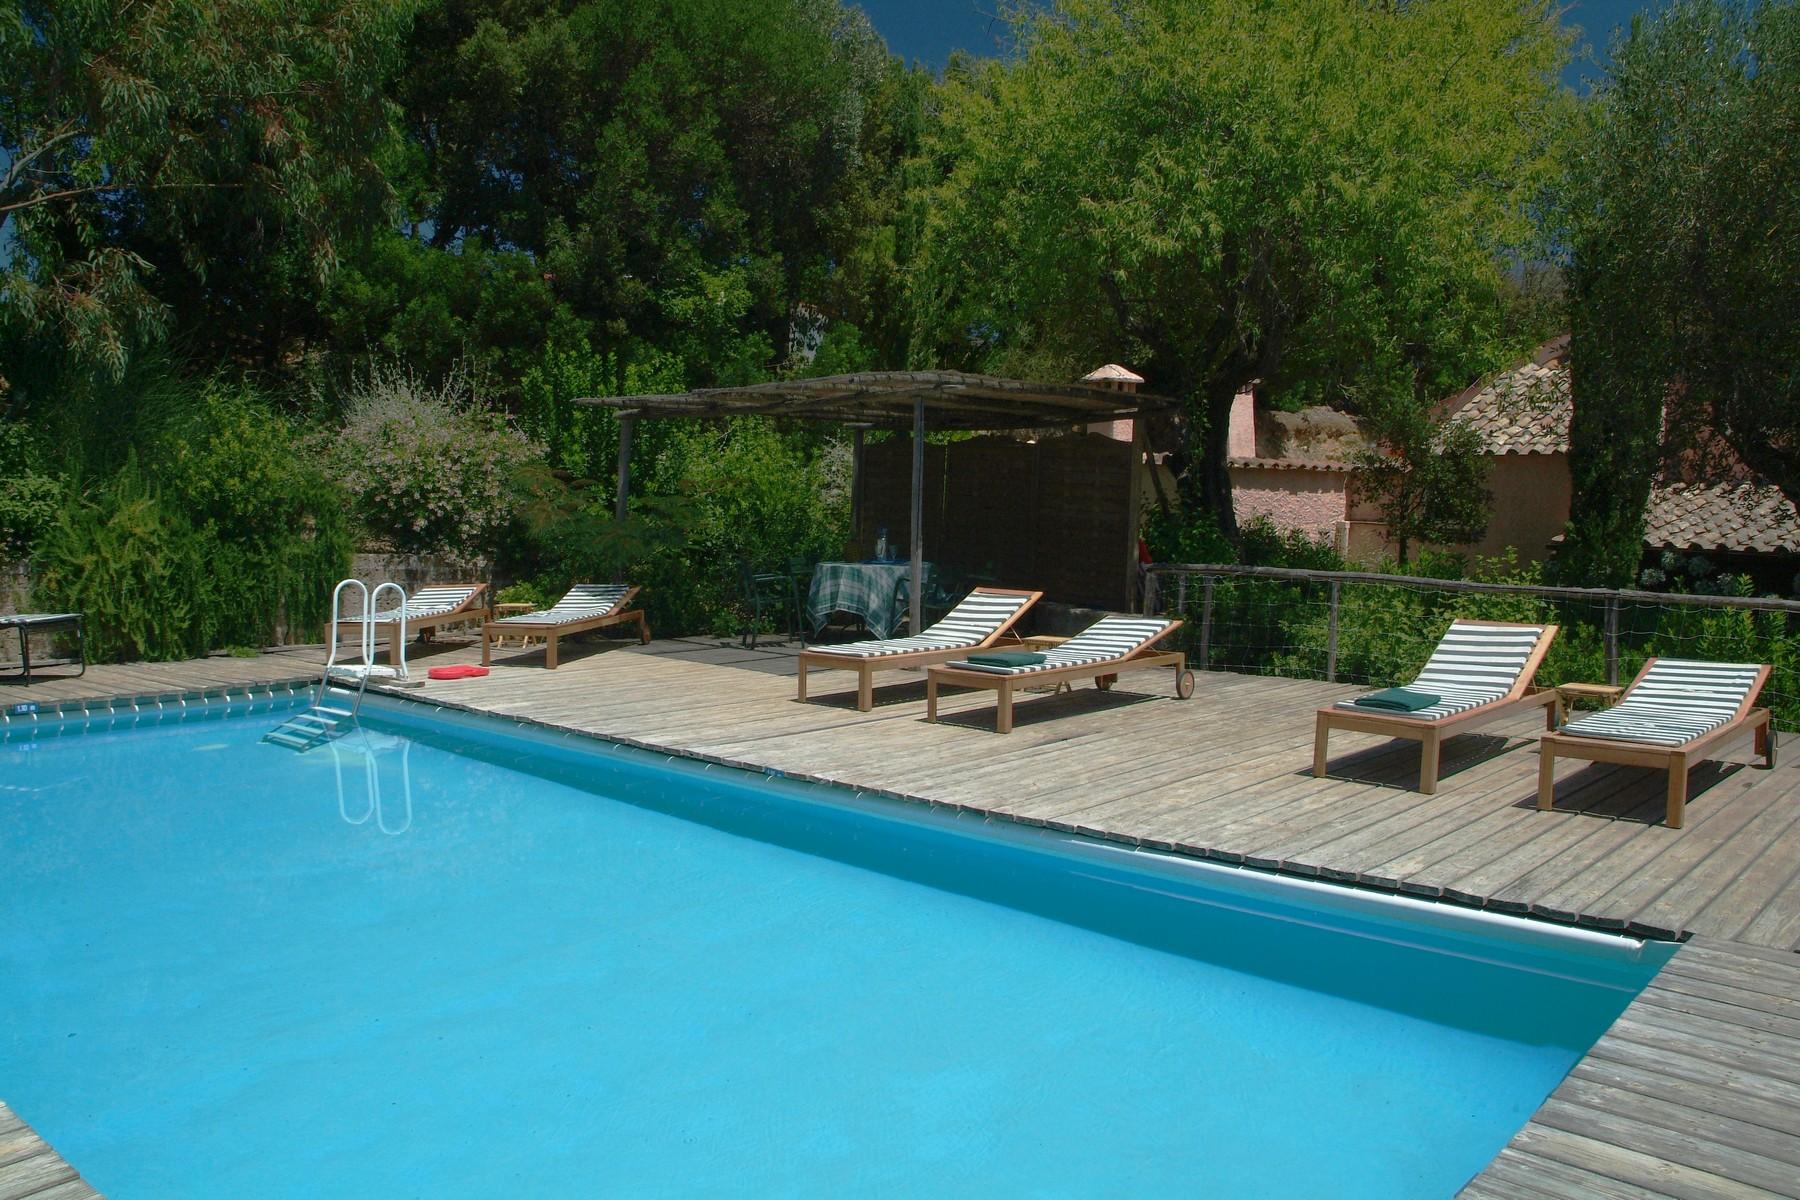 其它住宅 为 销售 在 Charming Property in Monte Argentario, Tuscany 格罗塞托其他地方, 格罗塞托, 意大利